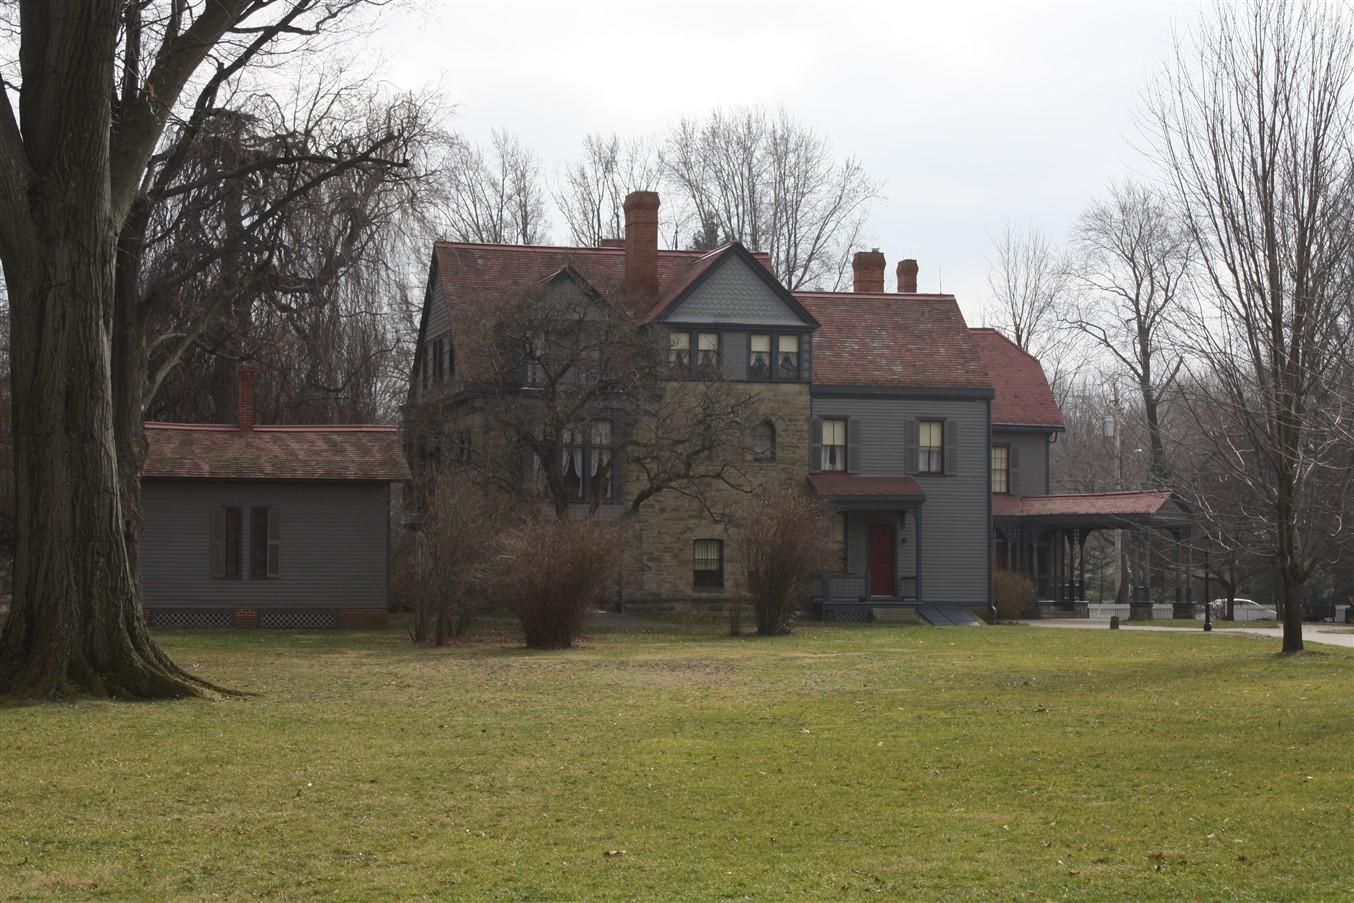 2012 02 04 23 Mentor OH Garfield Historical Site.jpg